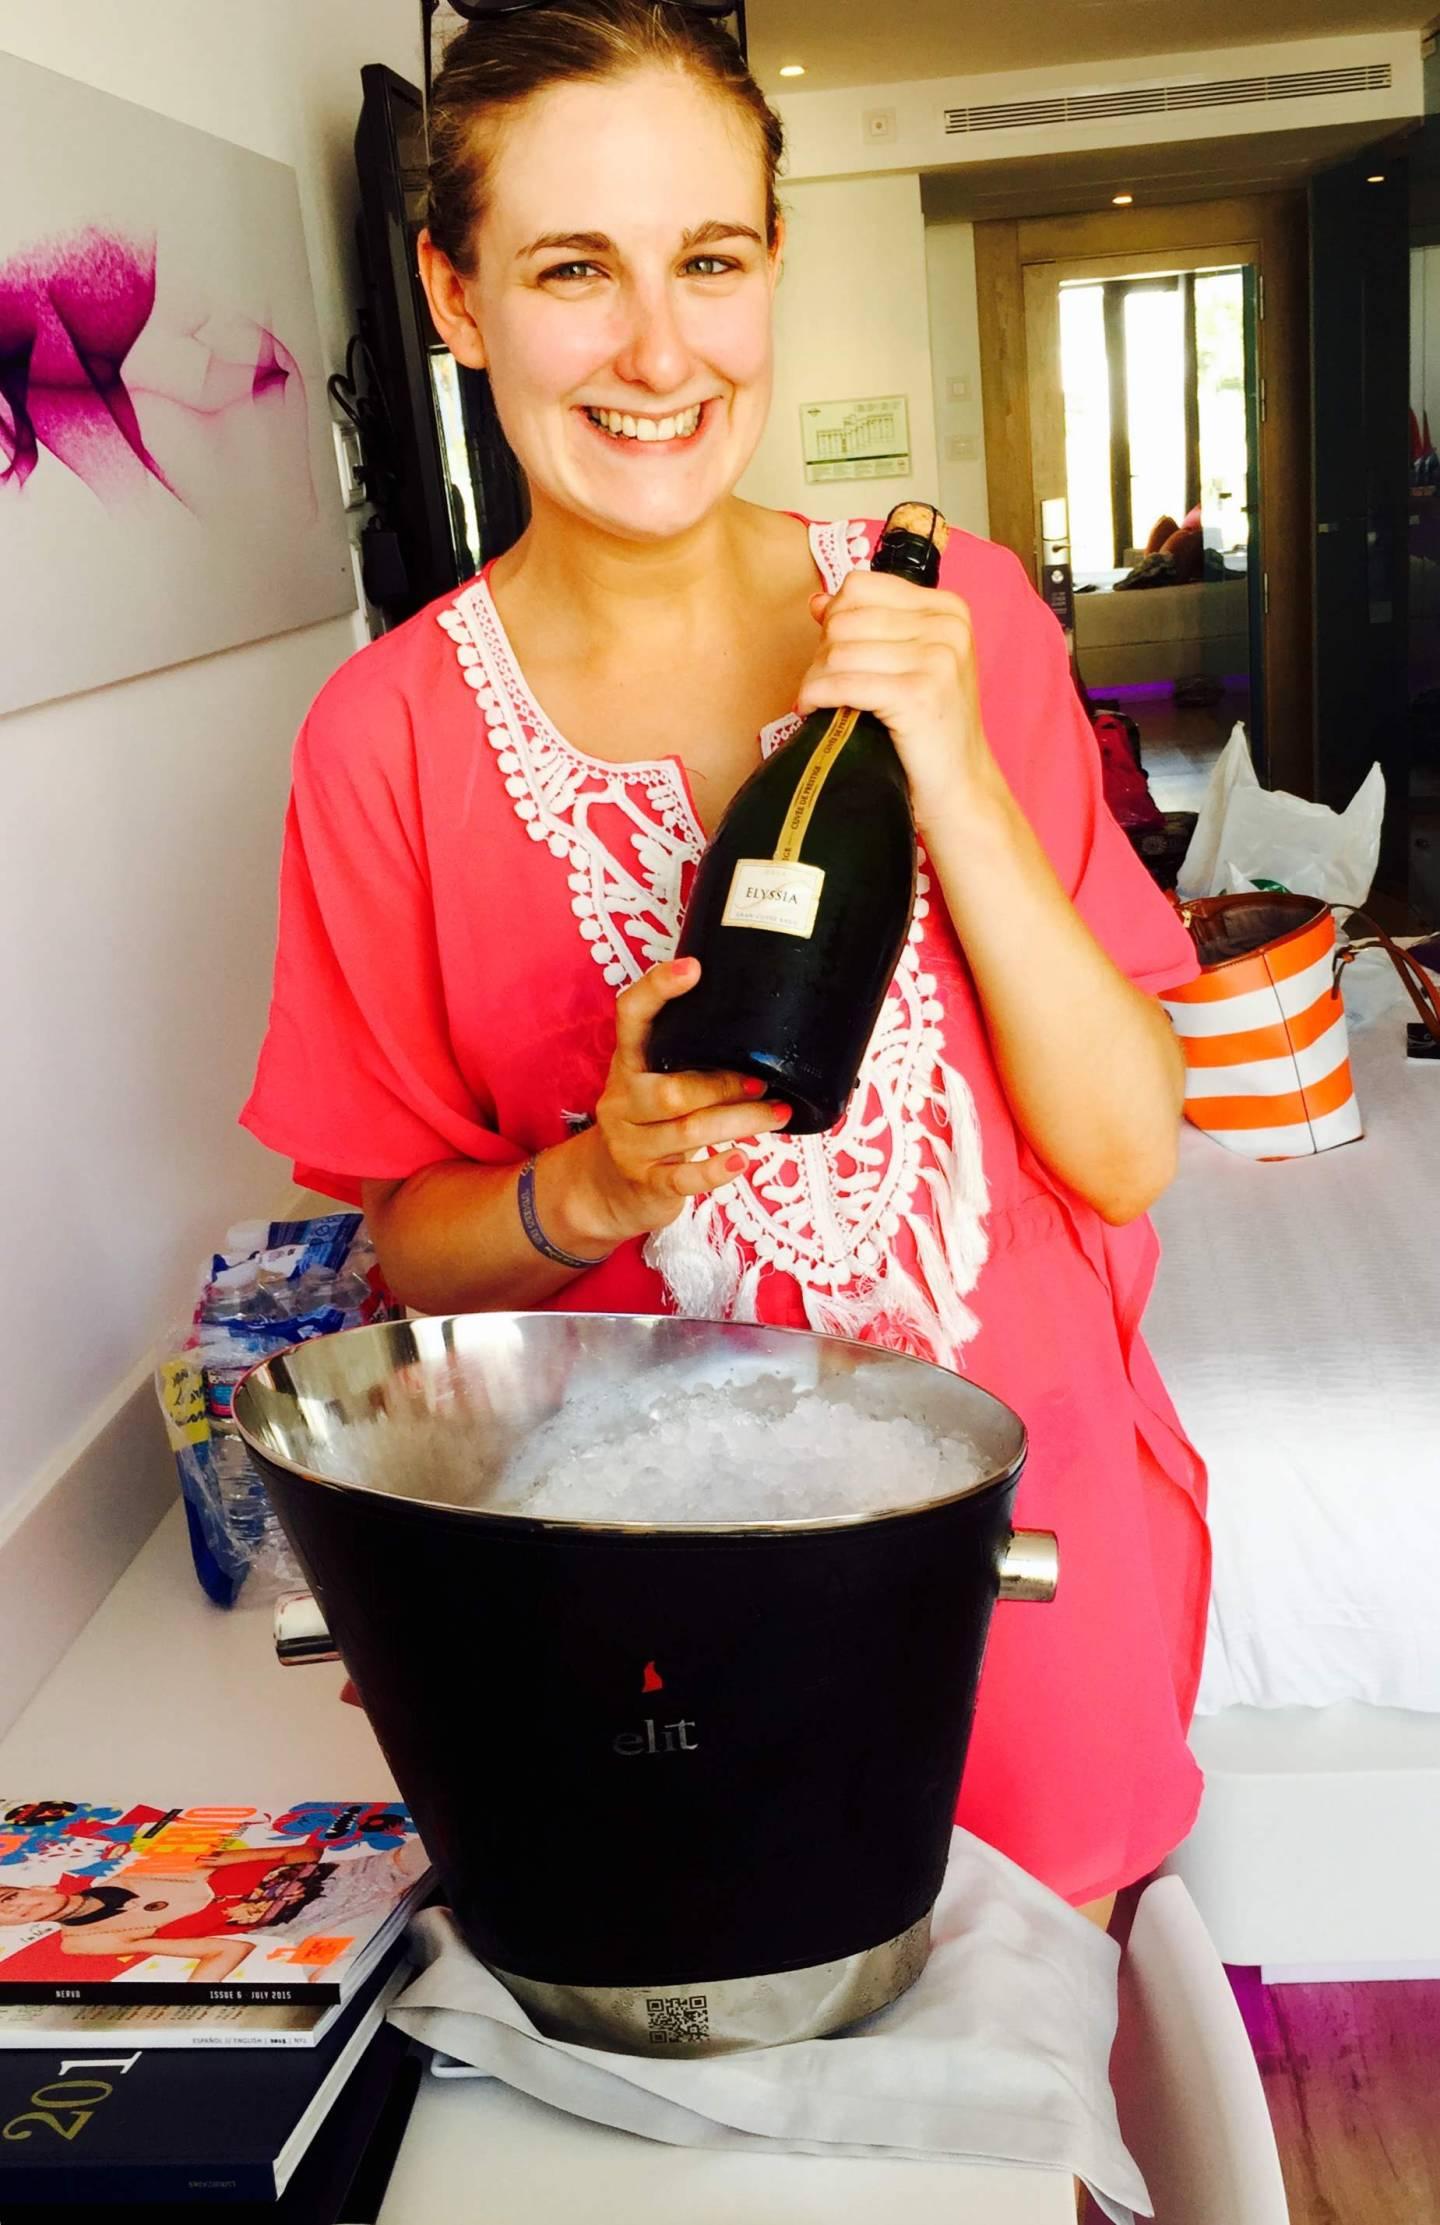 Jo celebrating with champagne